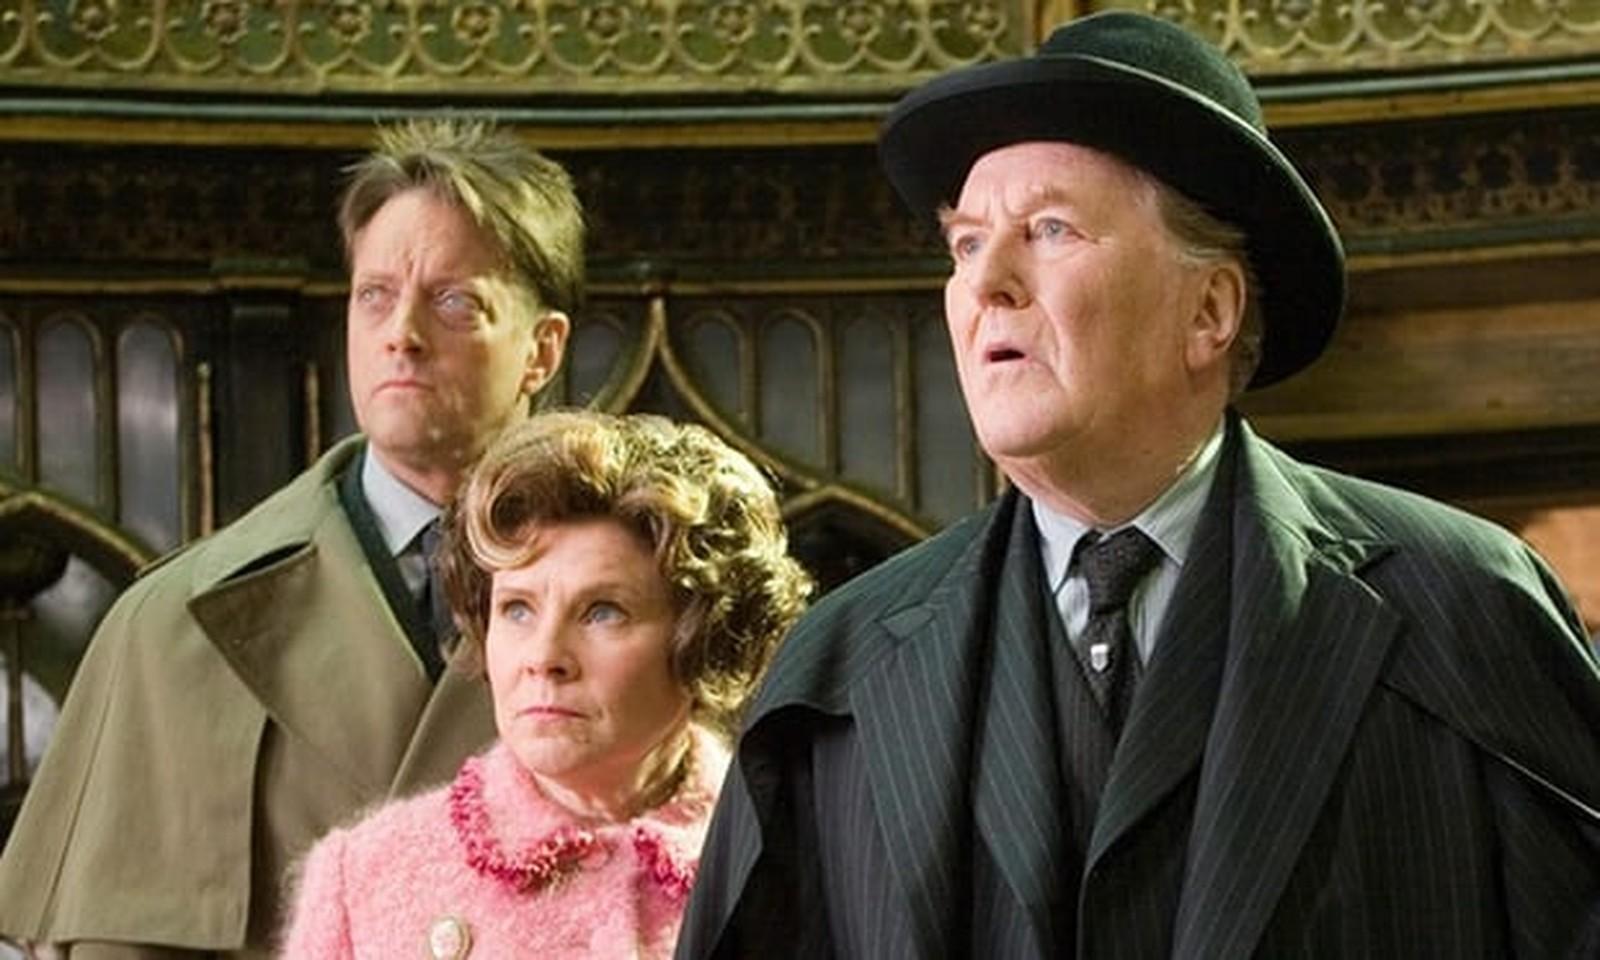 Morre ator Robert Hardy, ministro da magia de 'Harry Potter'